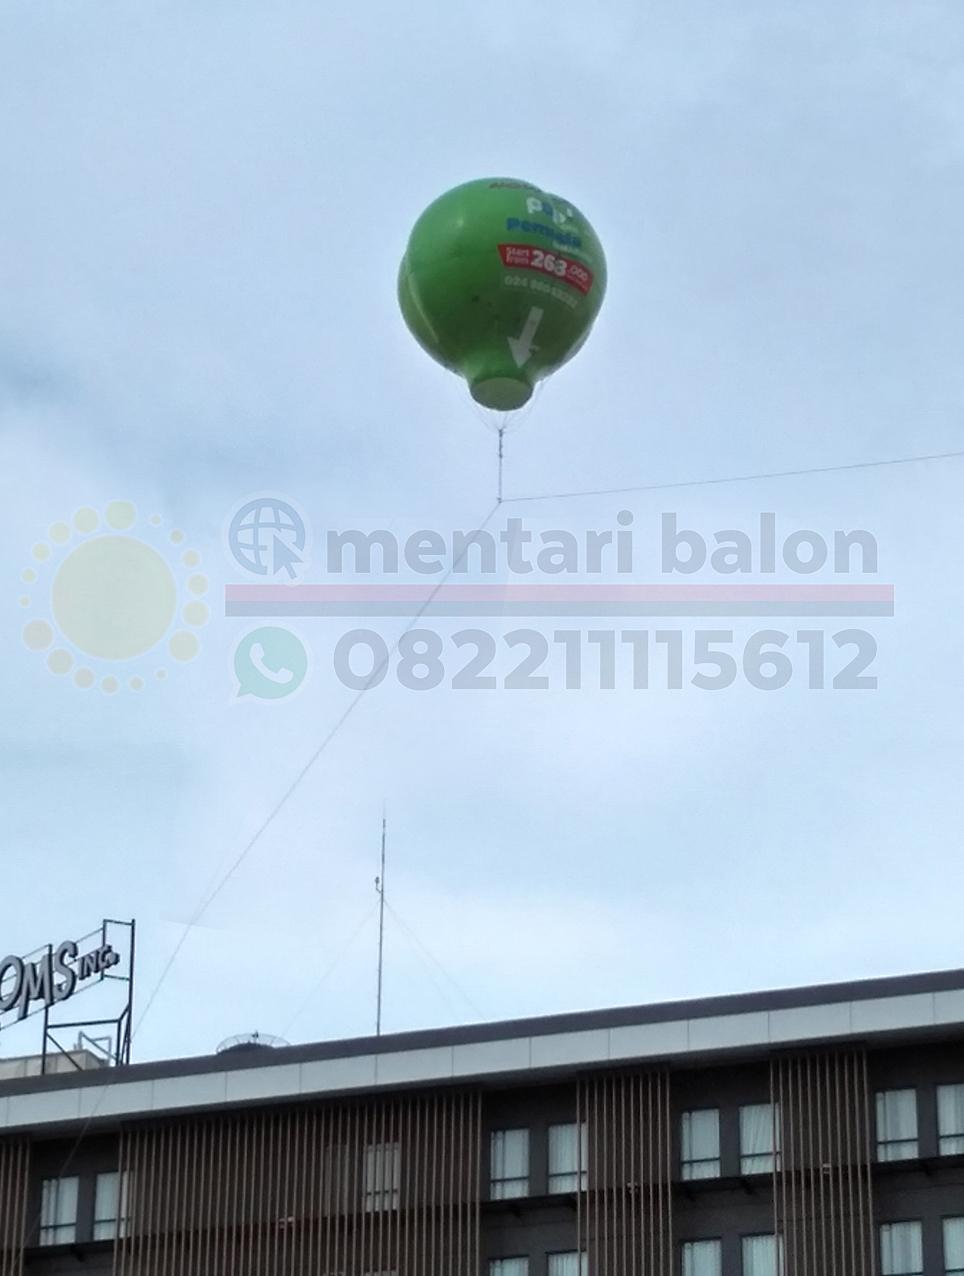 Balon Udara Promosi Hotel Mentari Balon Pusat Jual Balon Gate Harga Murah No 1 Mentari Balon Pusat Jual Balon Gate Harga Murah No 1